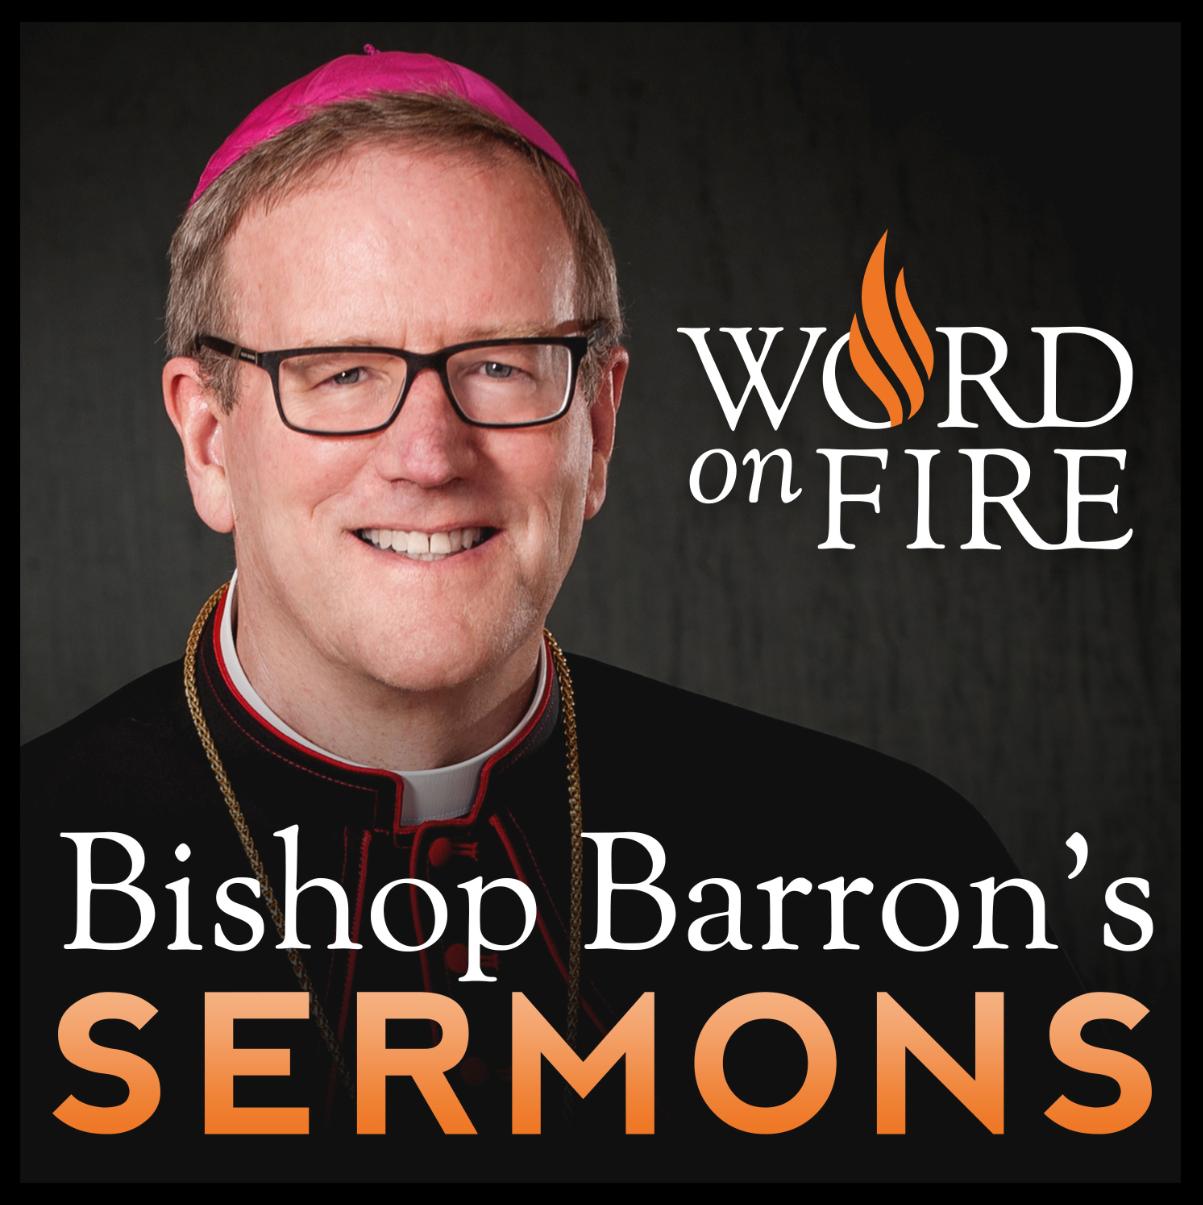 <![CDATA[Bishop Robert Barron's Sermons]]>